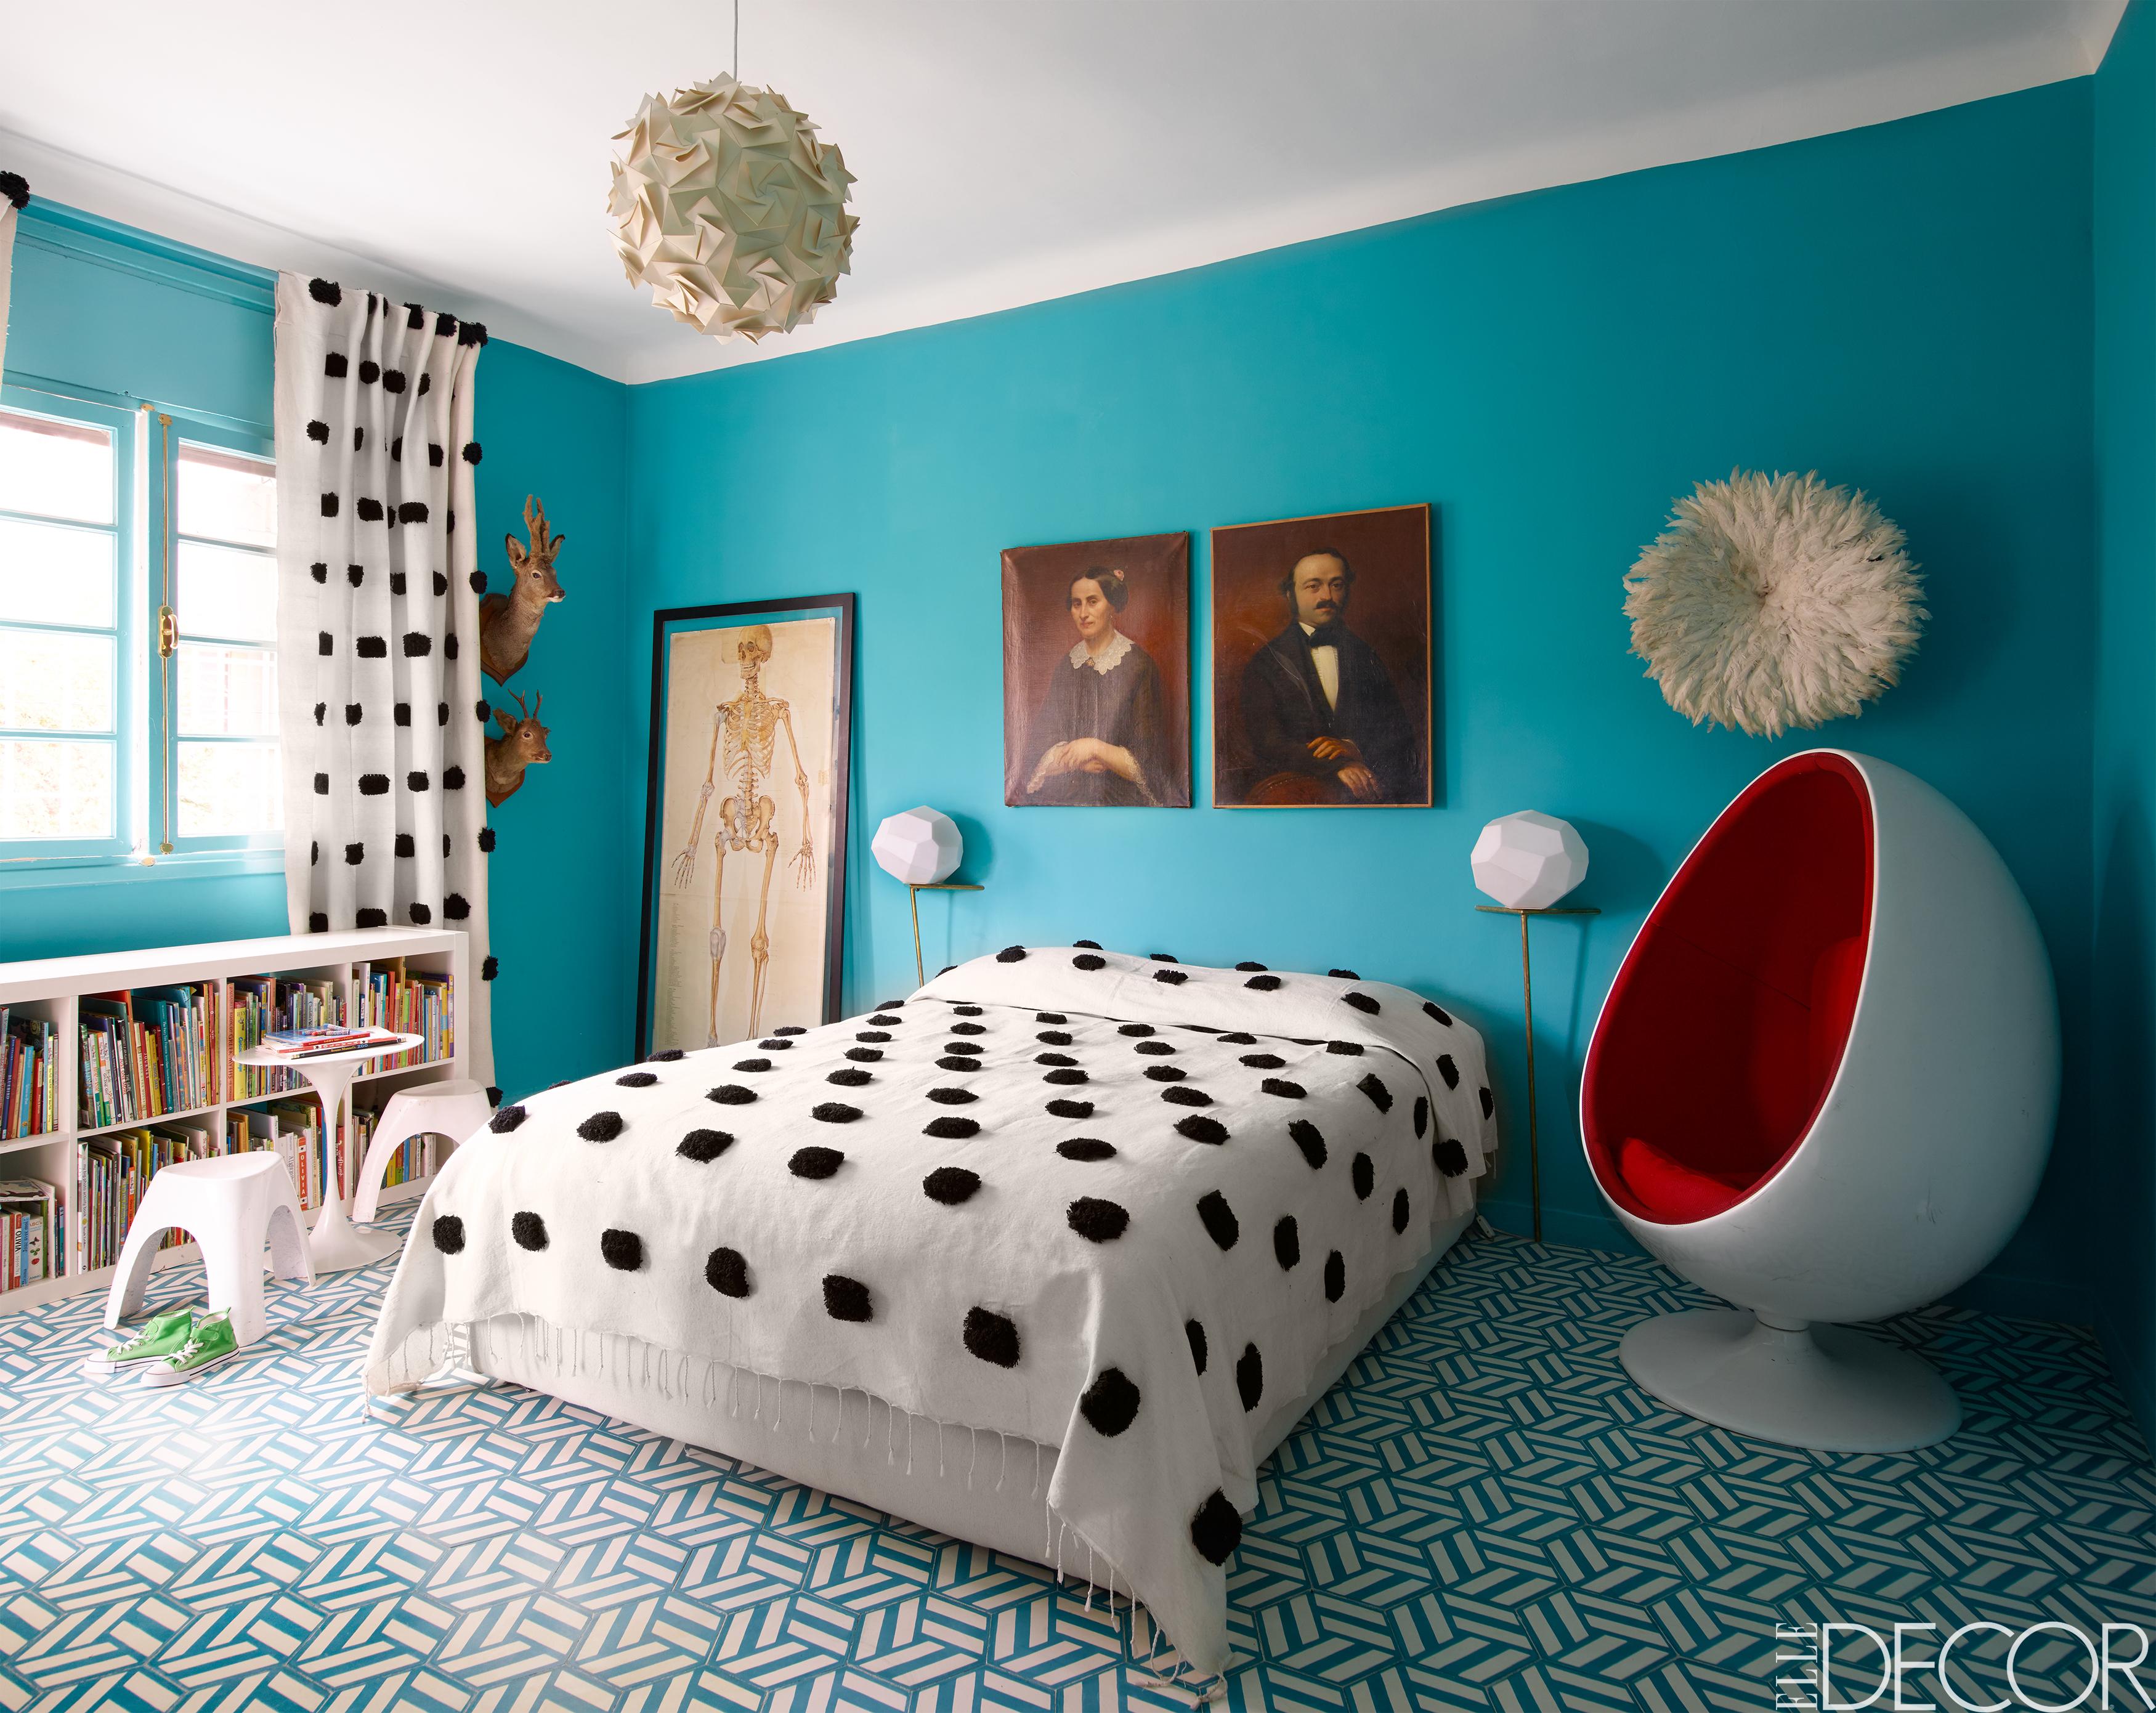 10 Girls Bedroom Decorating Ideas - Creative Girls Room ...